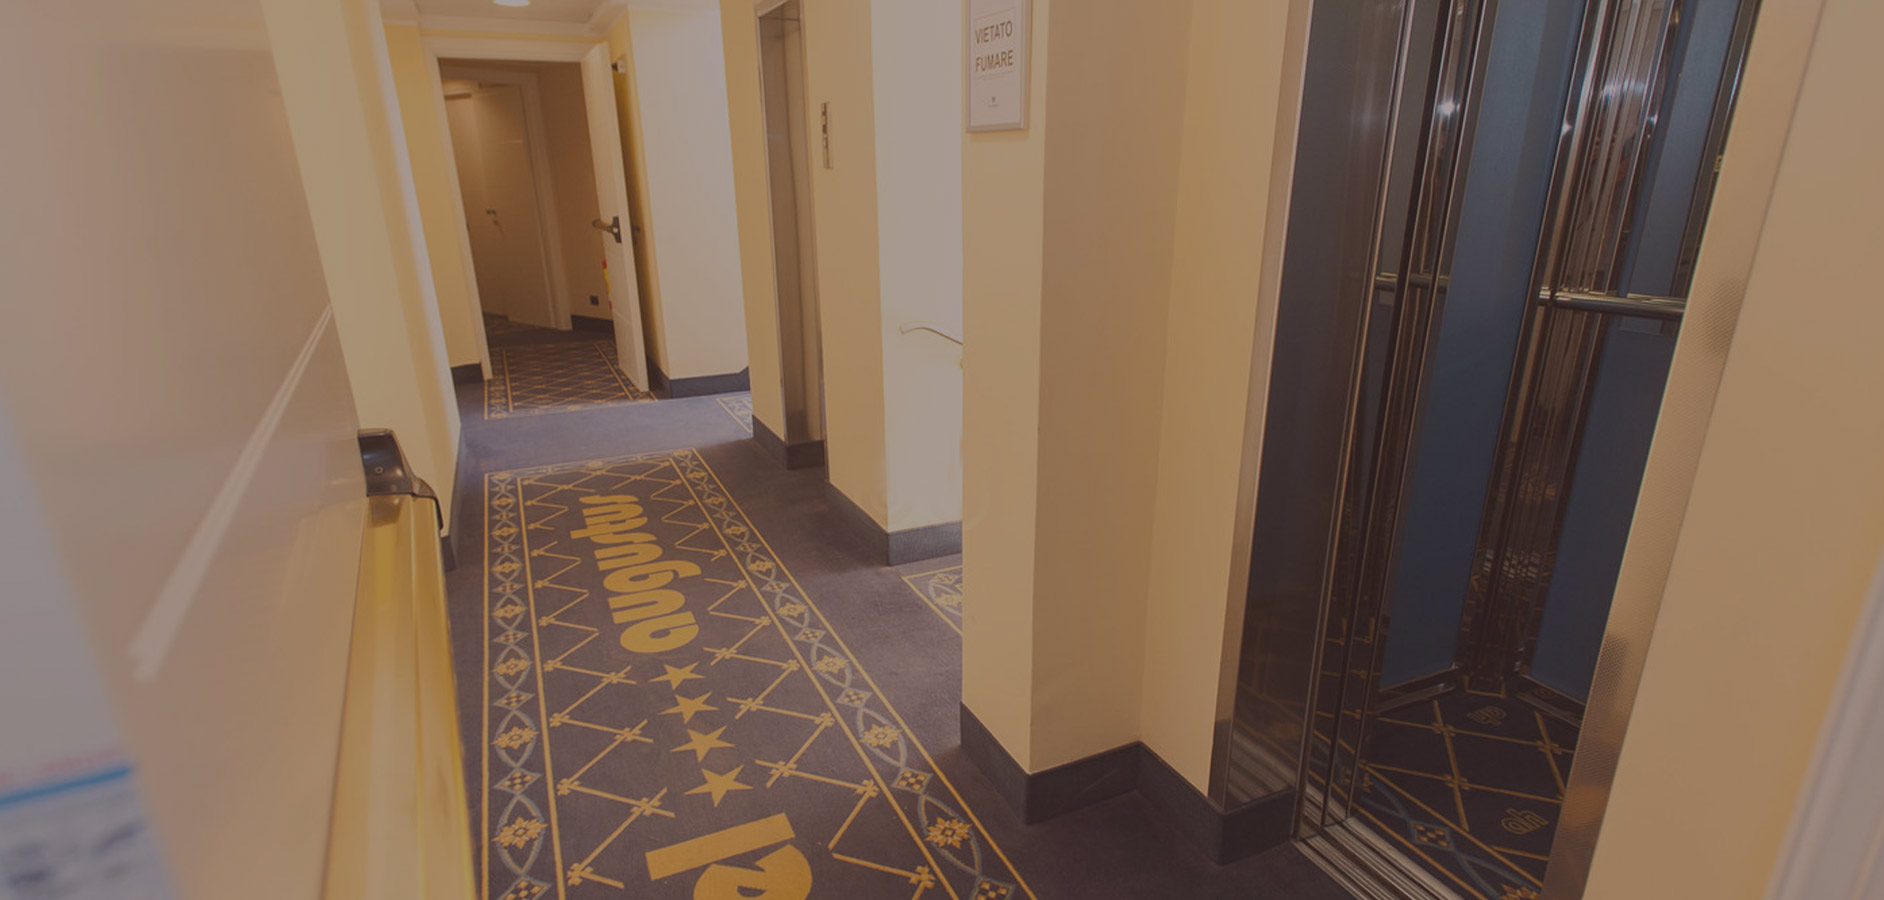 Sez camere – top- corridoio